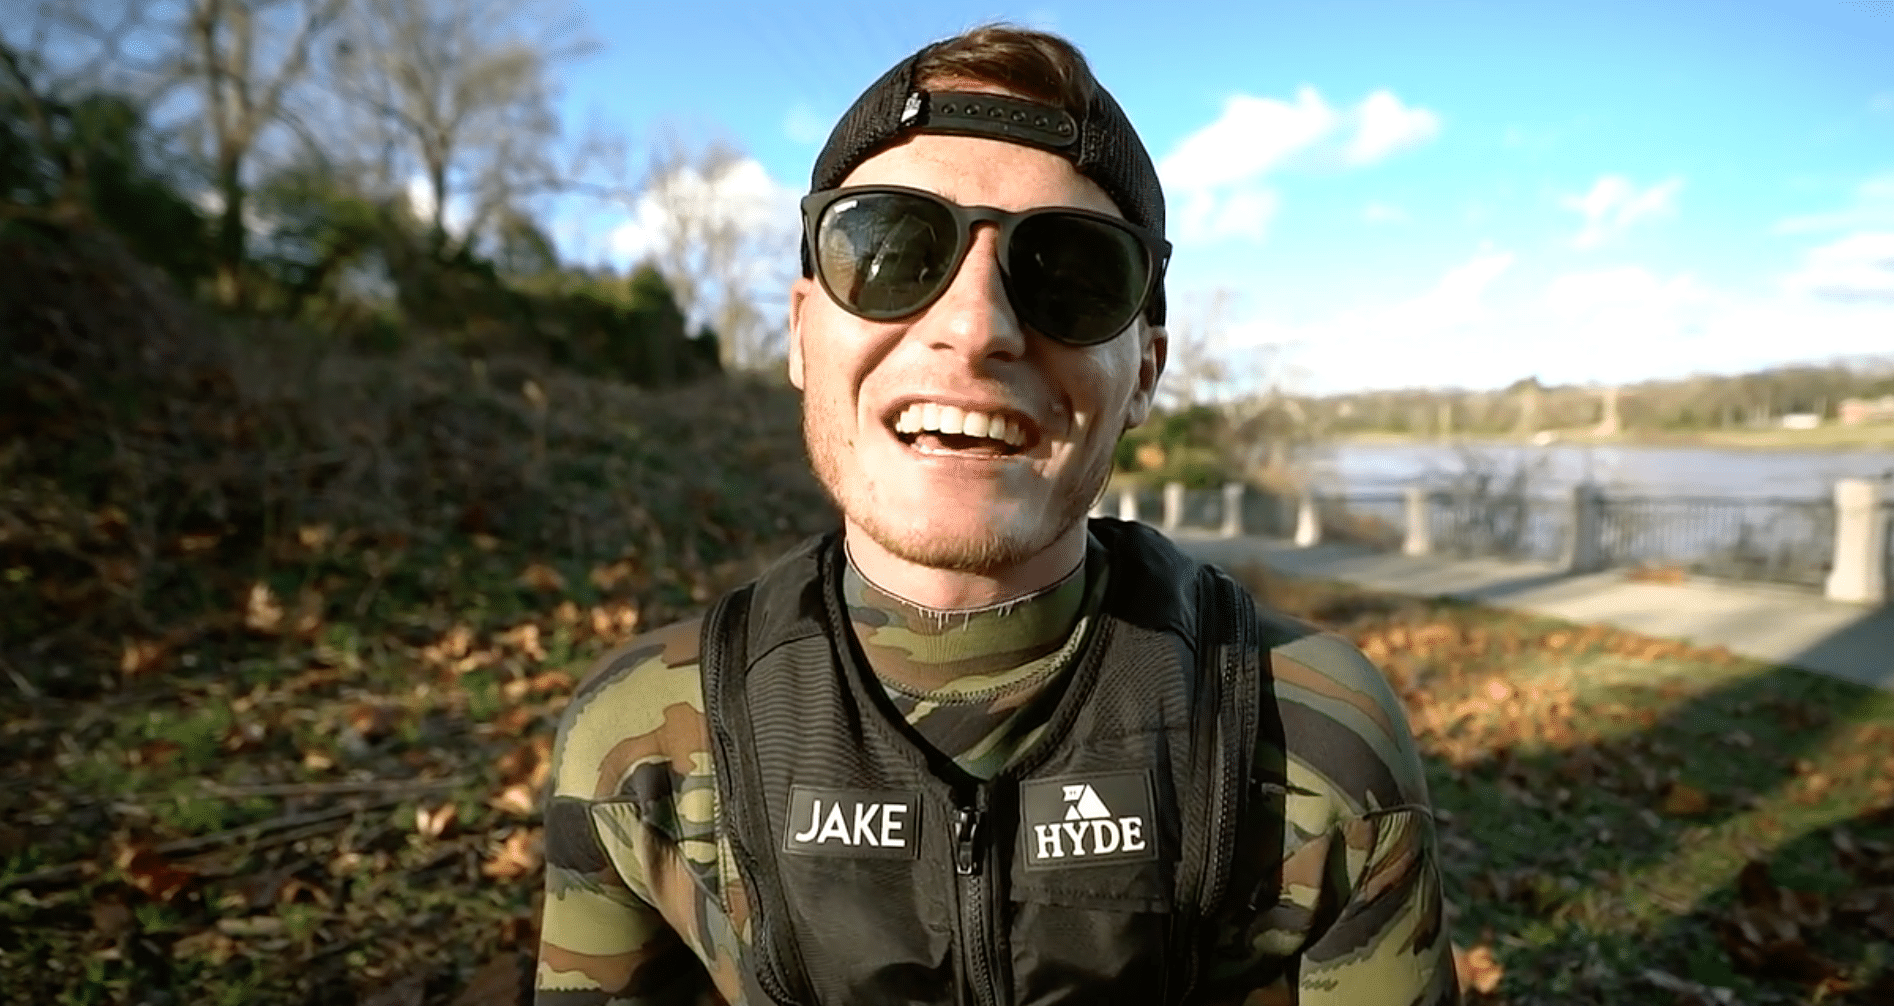 YouTuber DALLMYD To Receive Beneath The Sea's Visionary Award